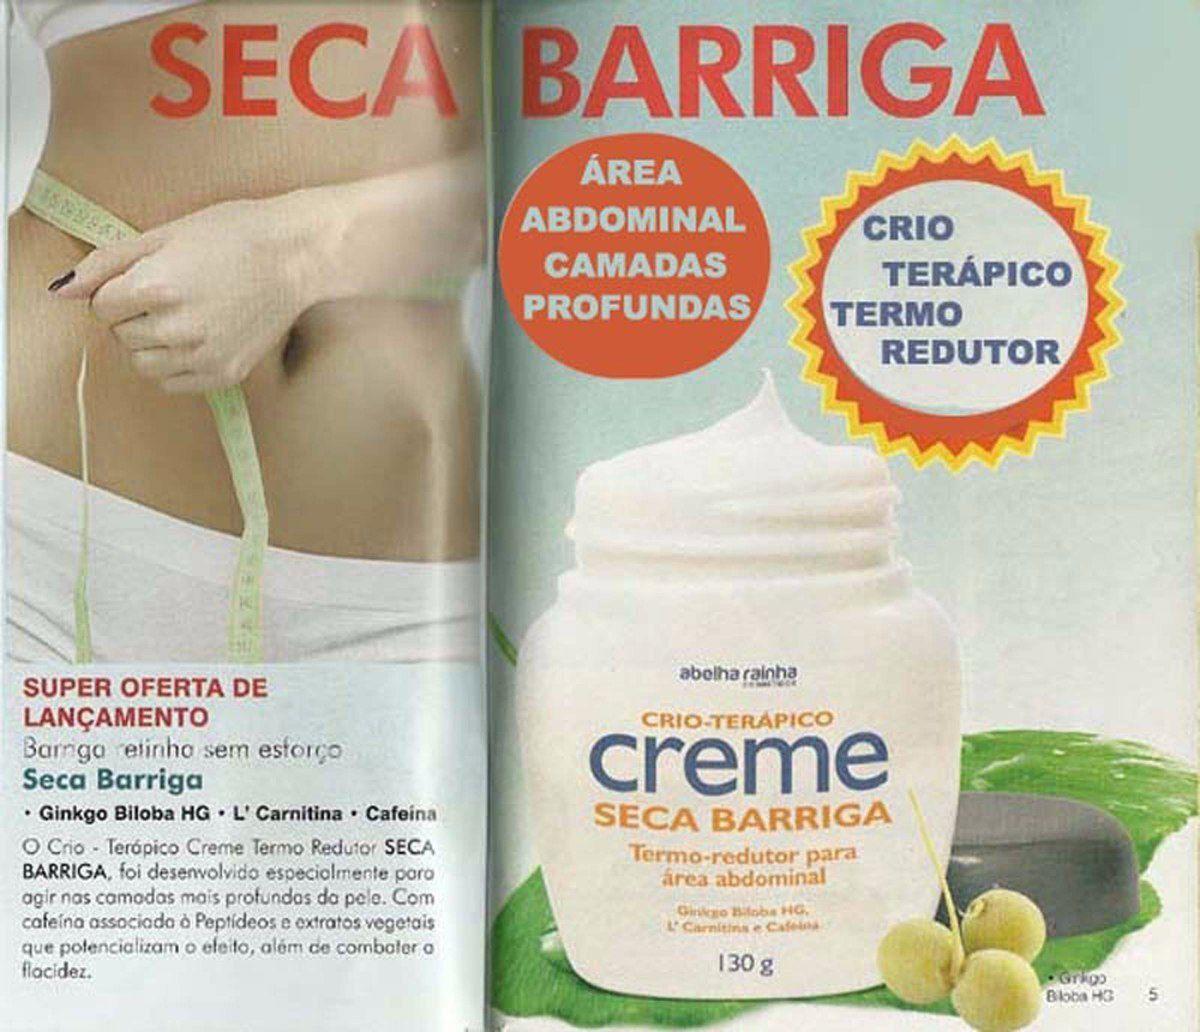 Kit 6 Crio Terápico Creme Seca Barriga Termo Redutor Abelha Rainha